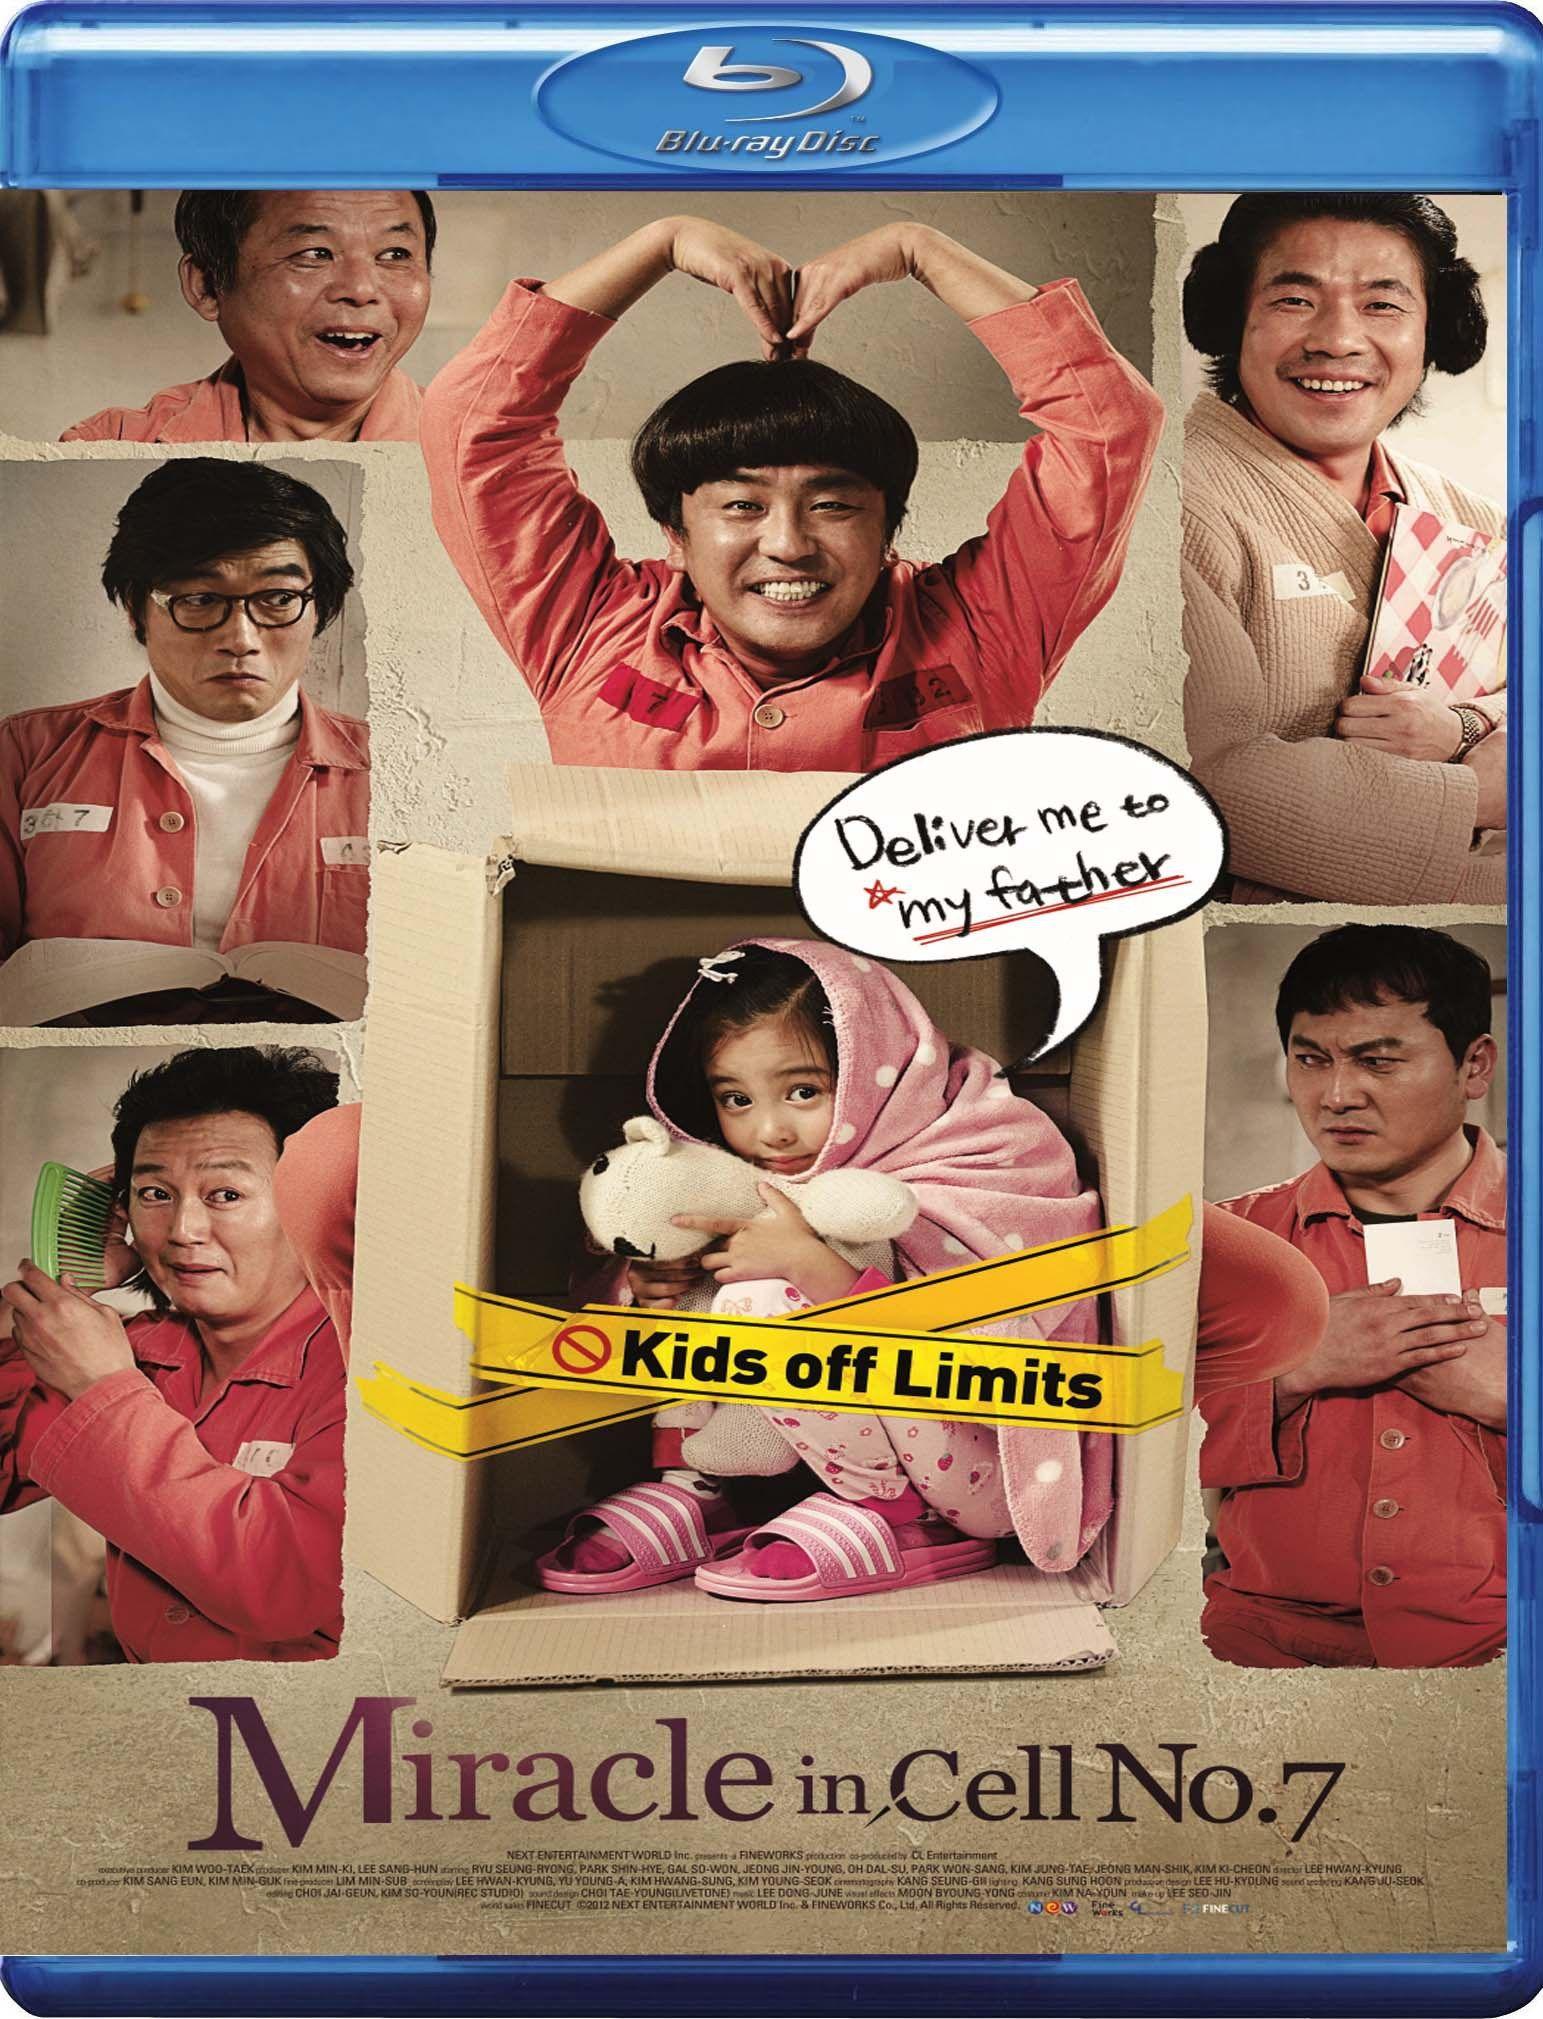 Download Film Korea Miracle In Cell No 7 Subtitle Indonesia Bioskop Penyakit Kejiwaan Film